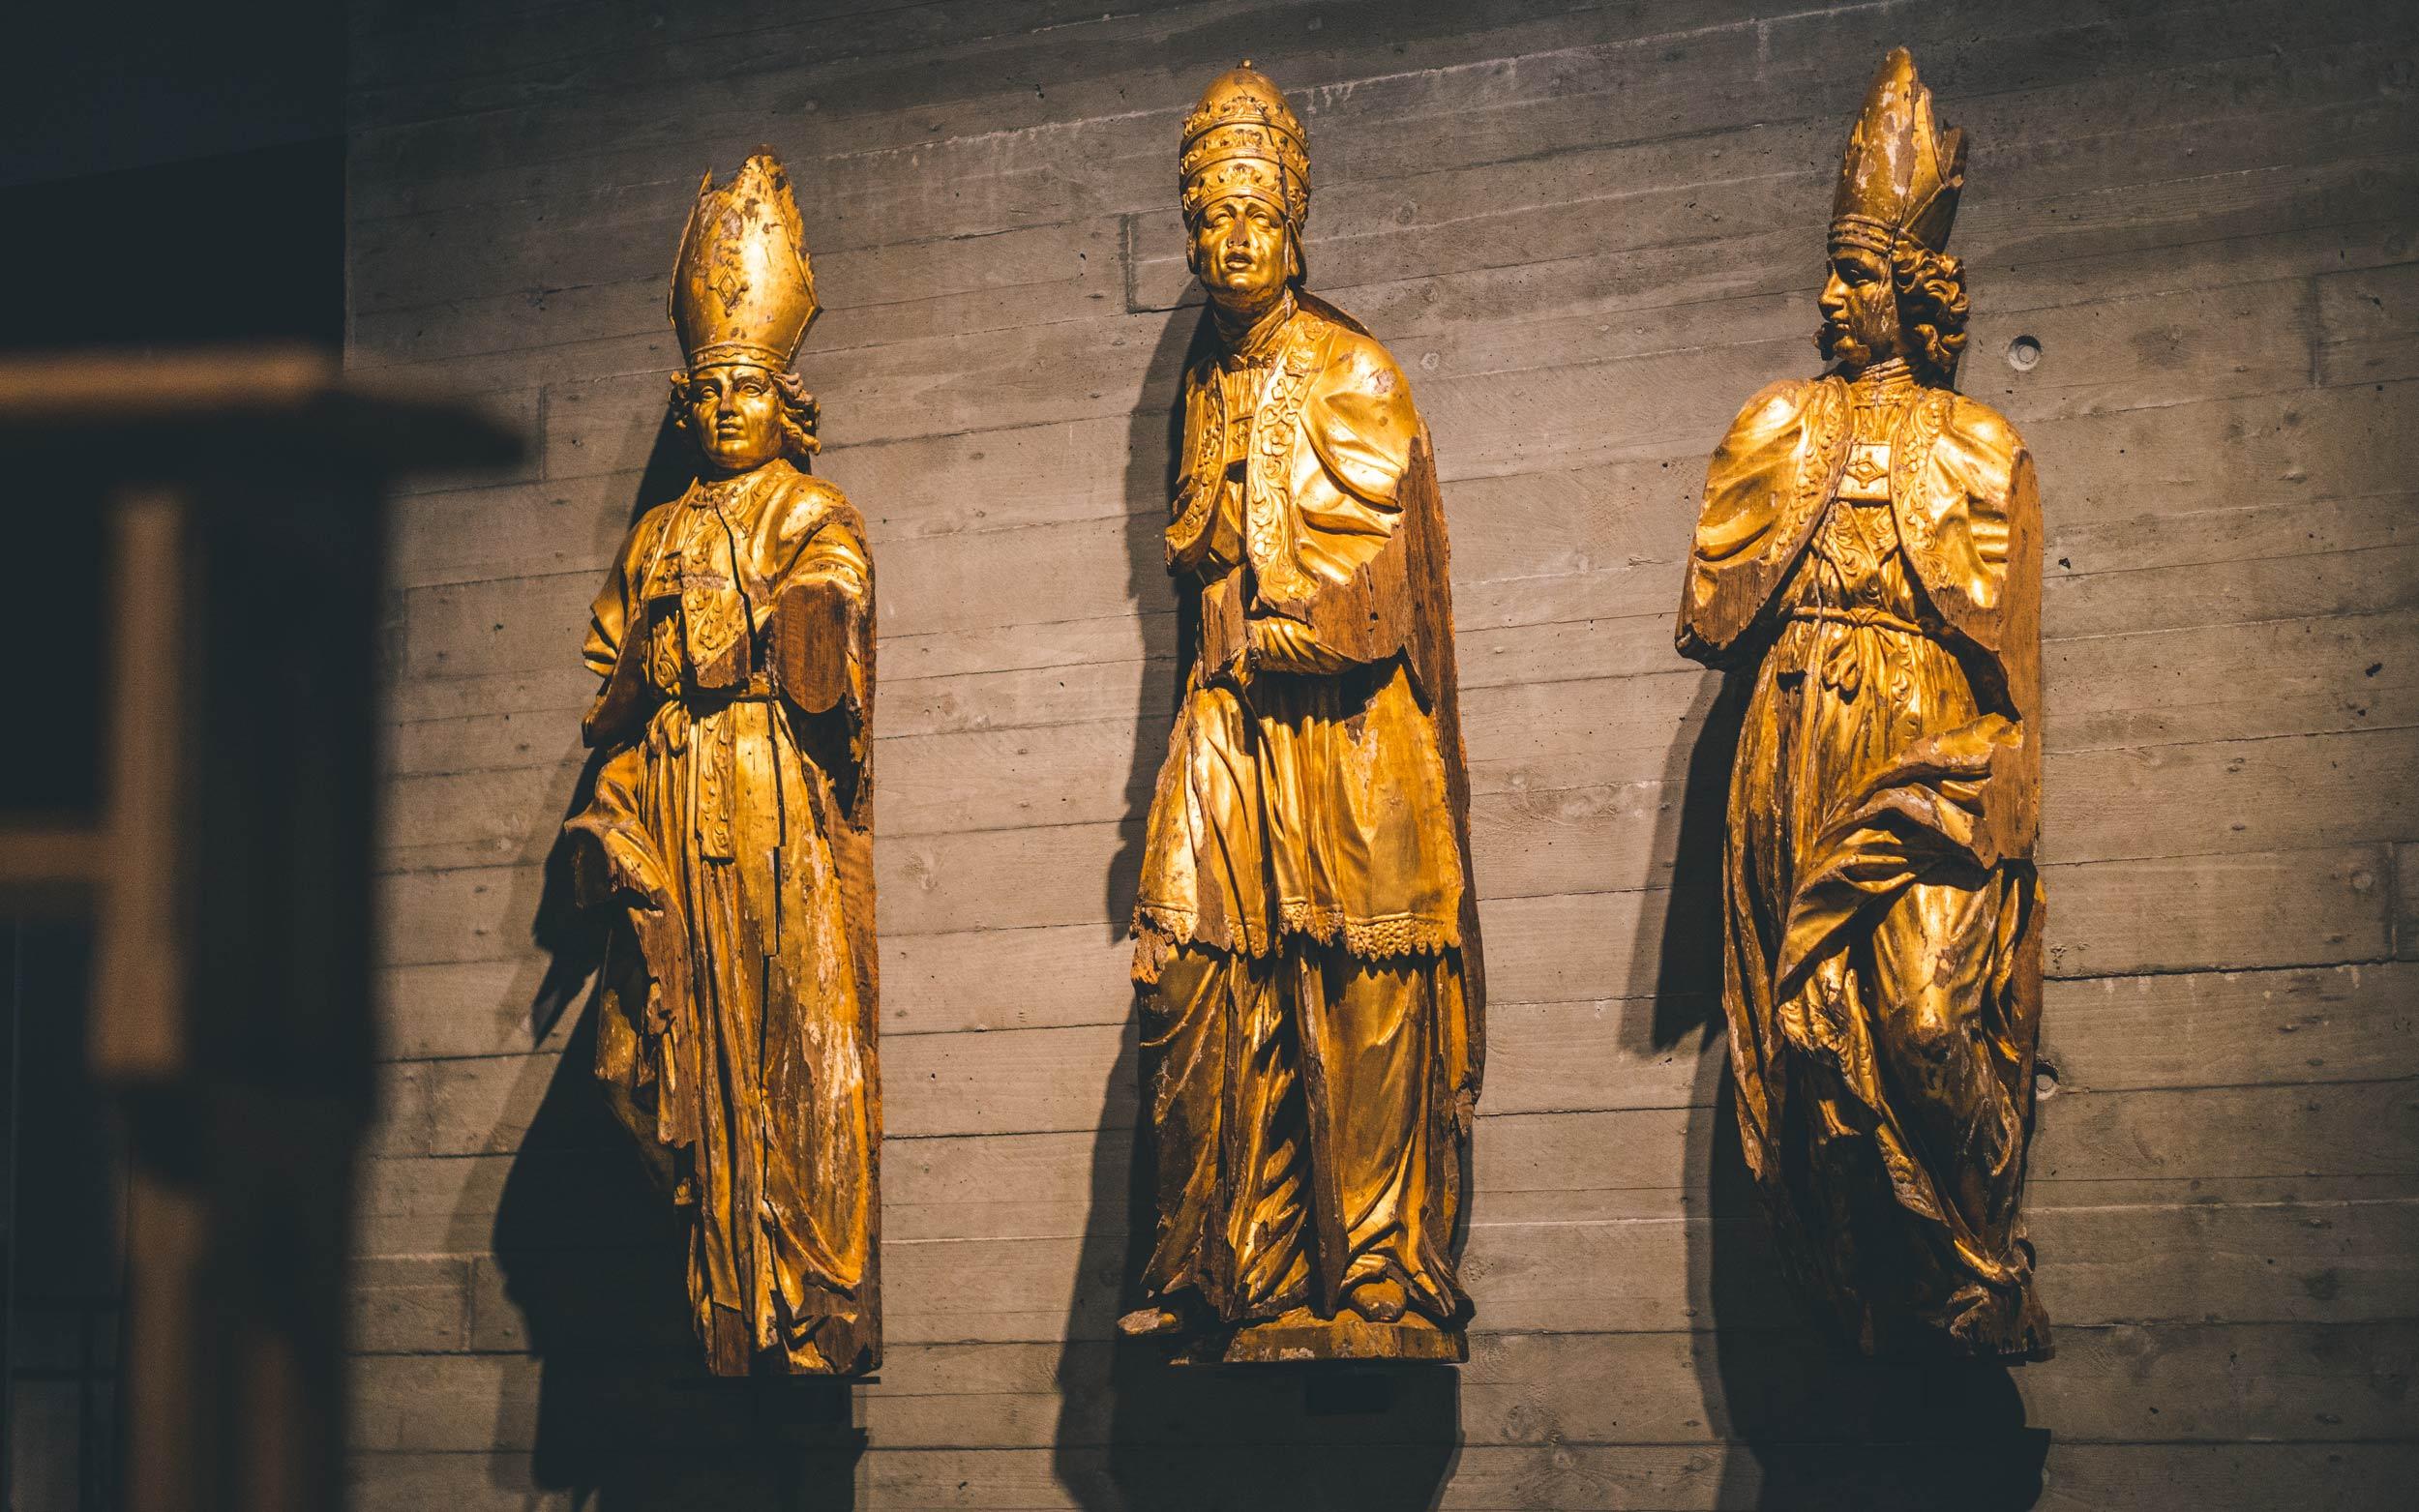 kult Dauerausstellung Grenze kirchlich